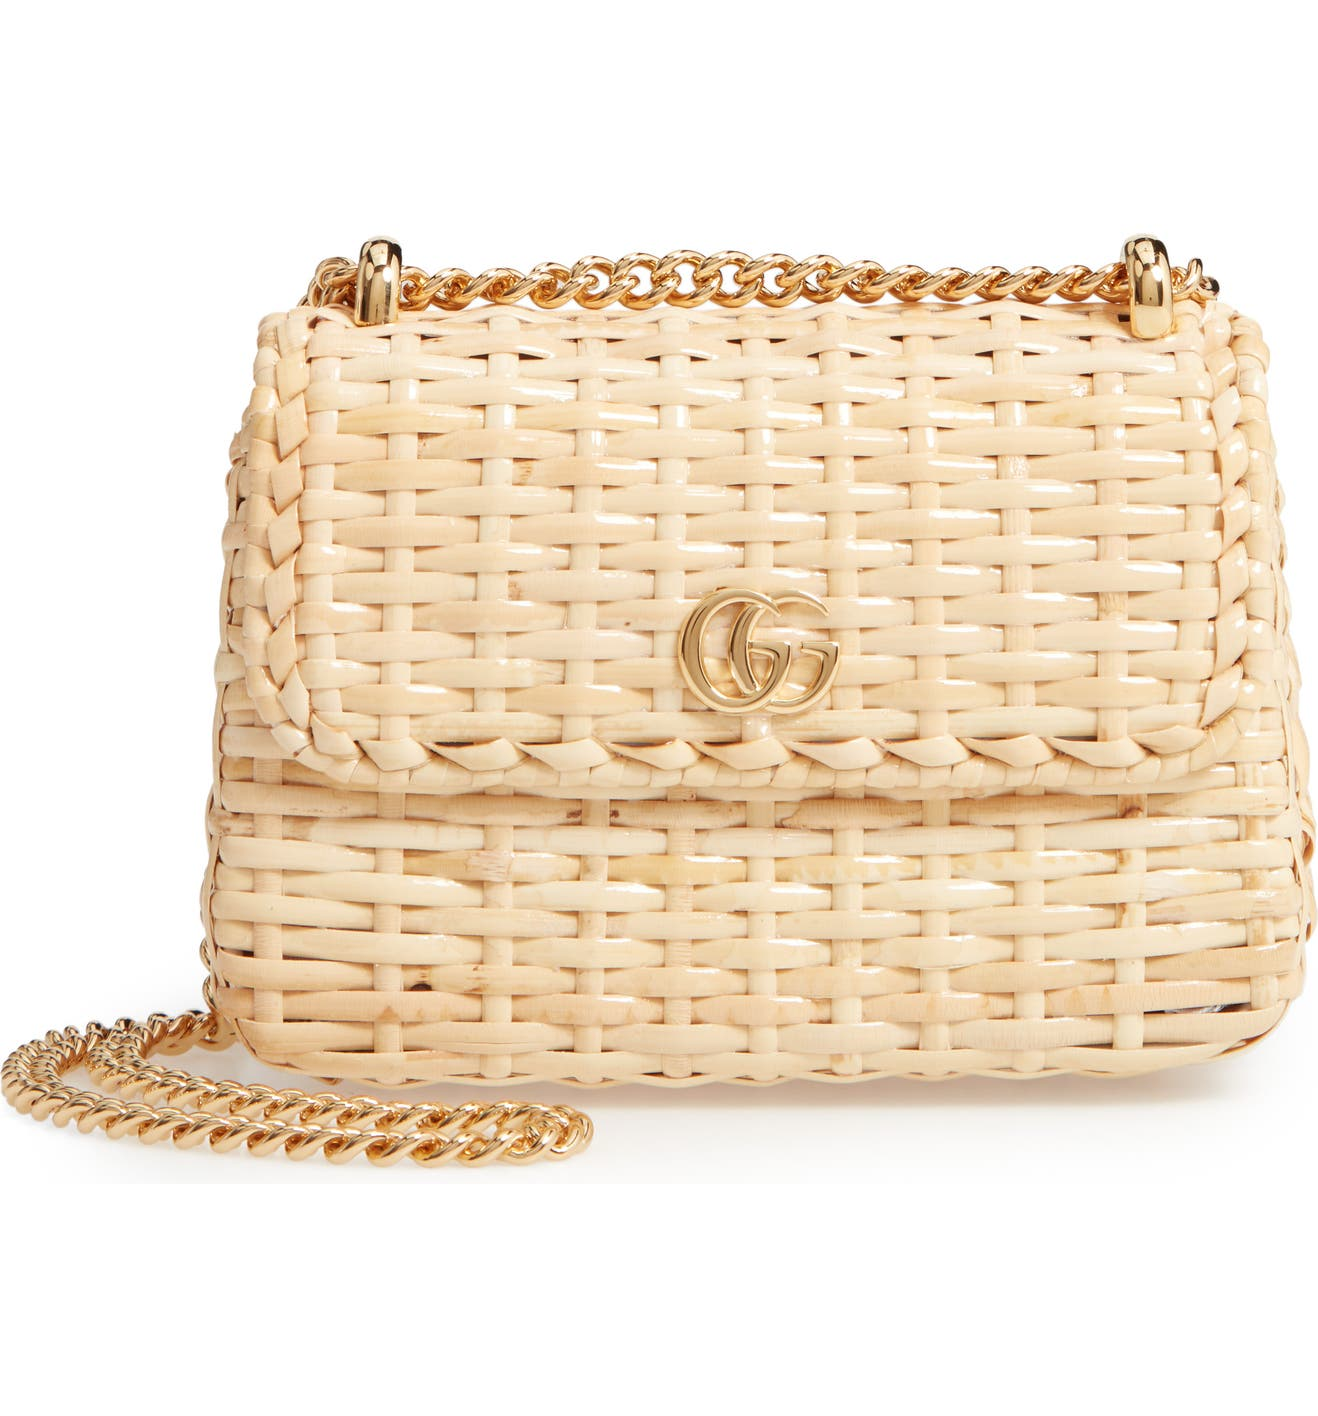 ca0591284d5ef8 Gucci Linea Cestino Glazed Wicker Mini Shoulder Bag | Nordstrom